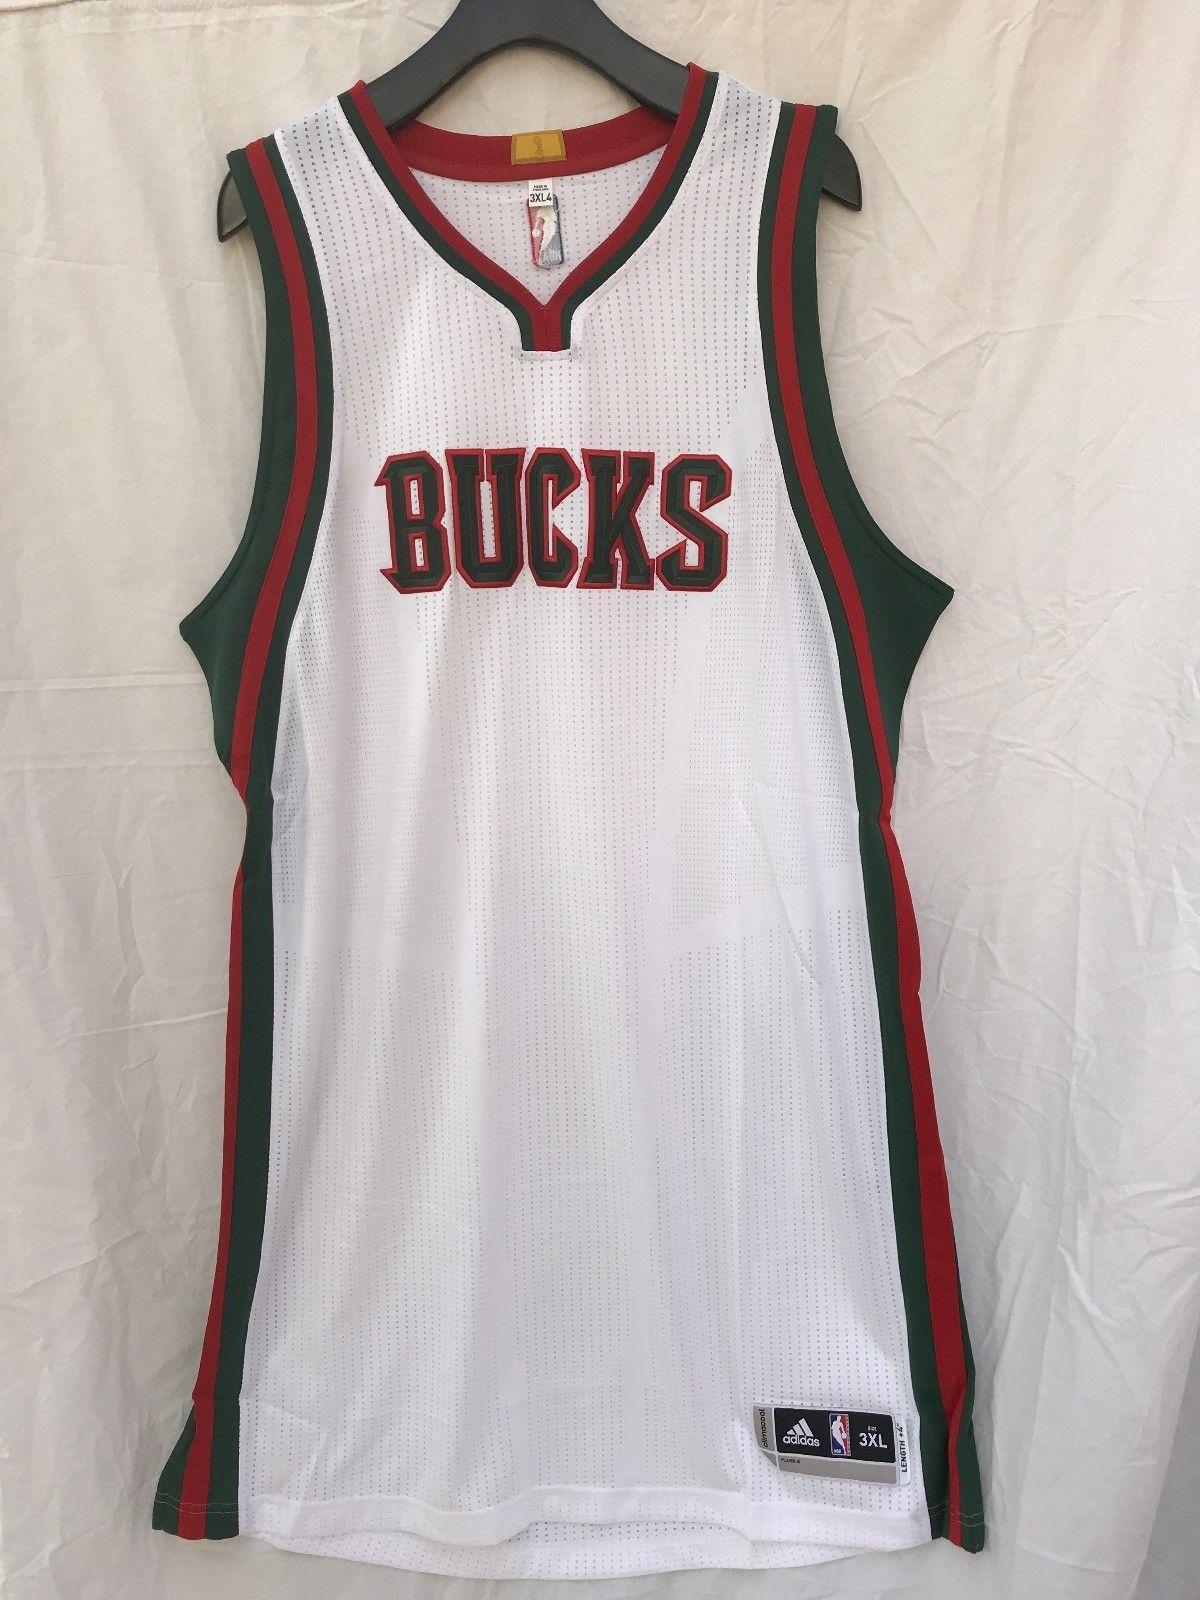 59ef7a42e38 Milwaukee Bucks adidas Rev30 Blank Home White NBA Basketball Jersey  (2015-2017)